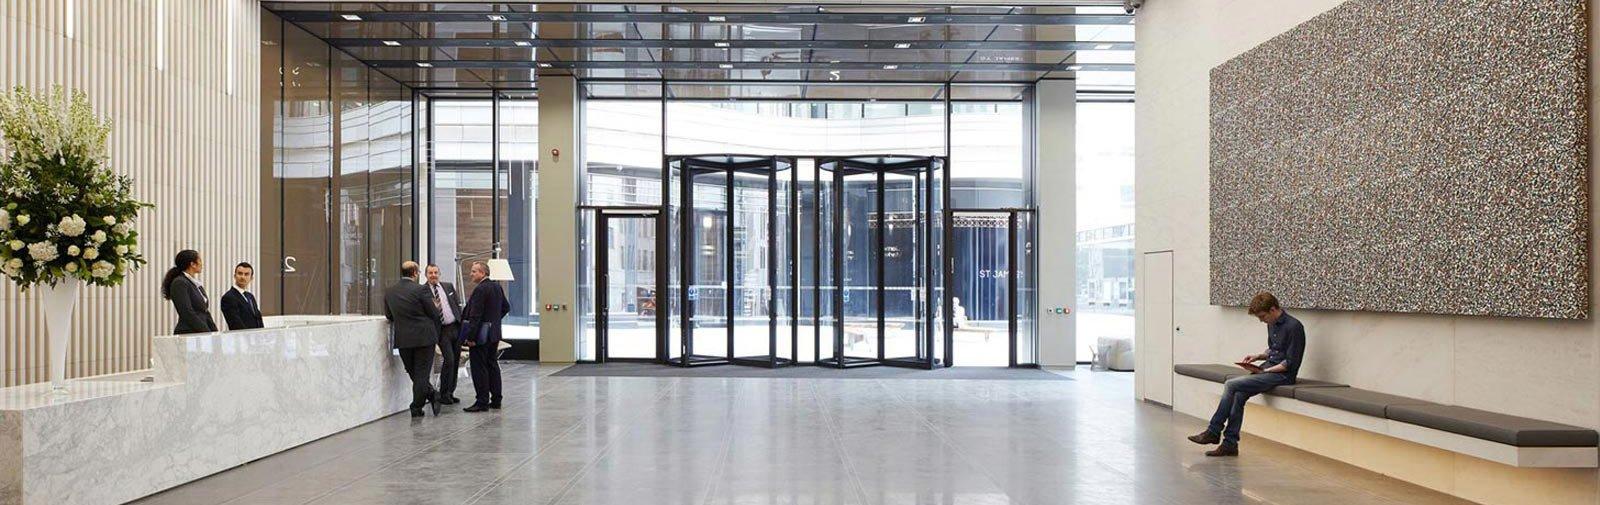 Revolving Door entrance solution carousel